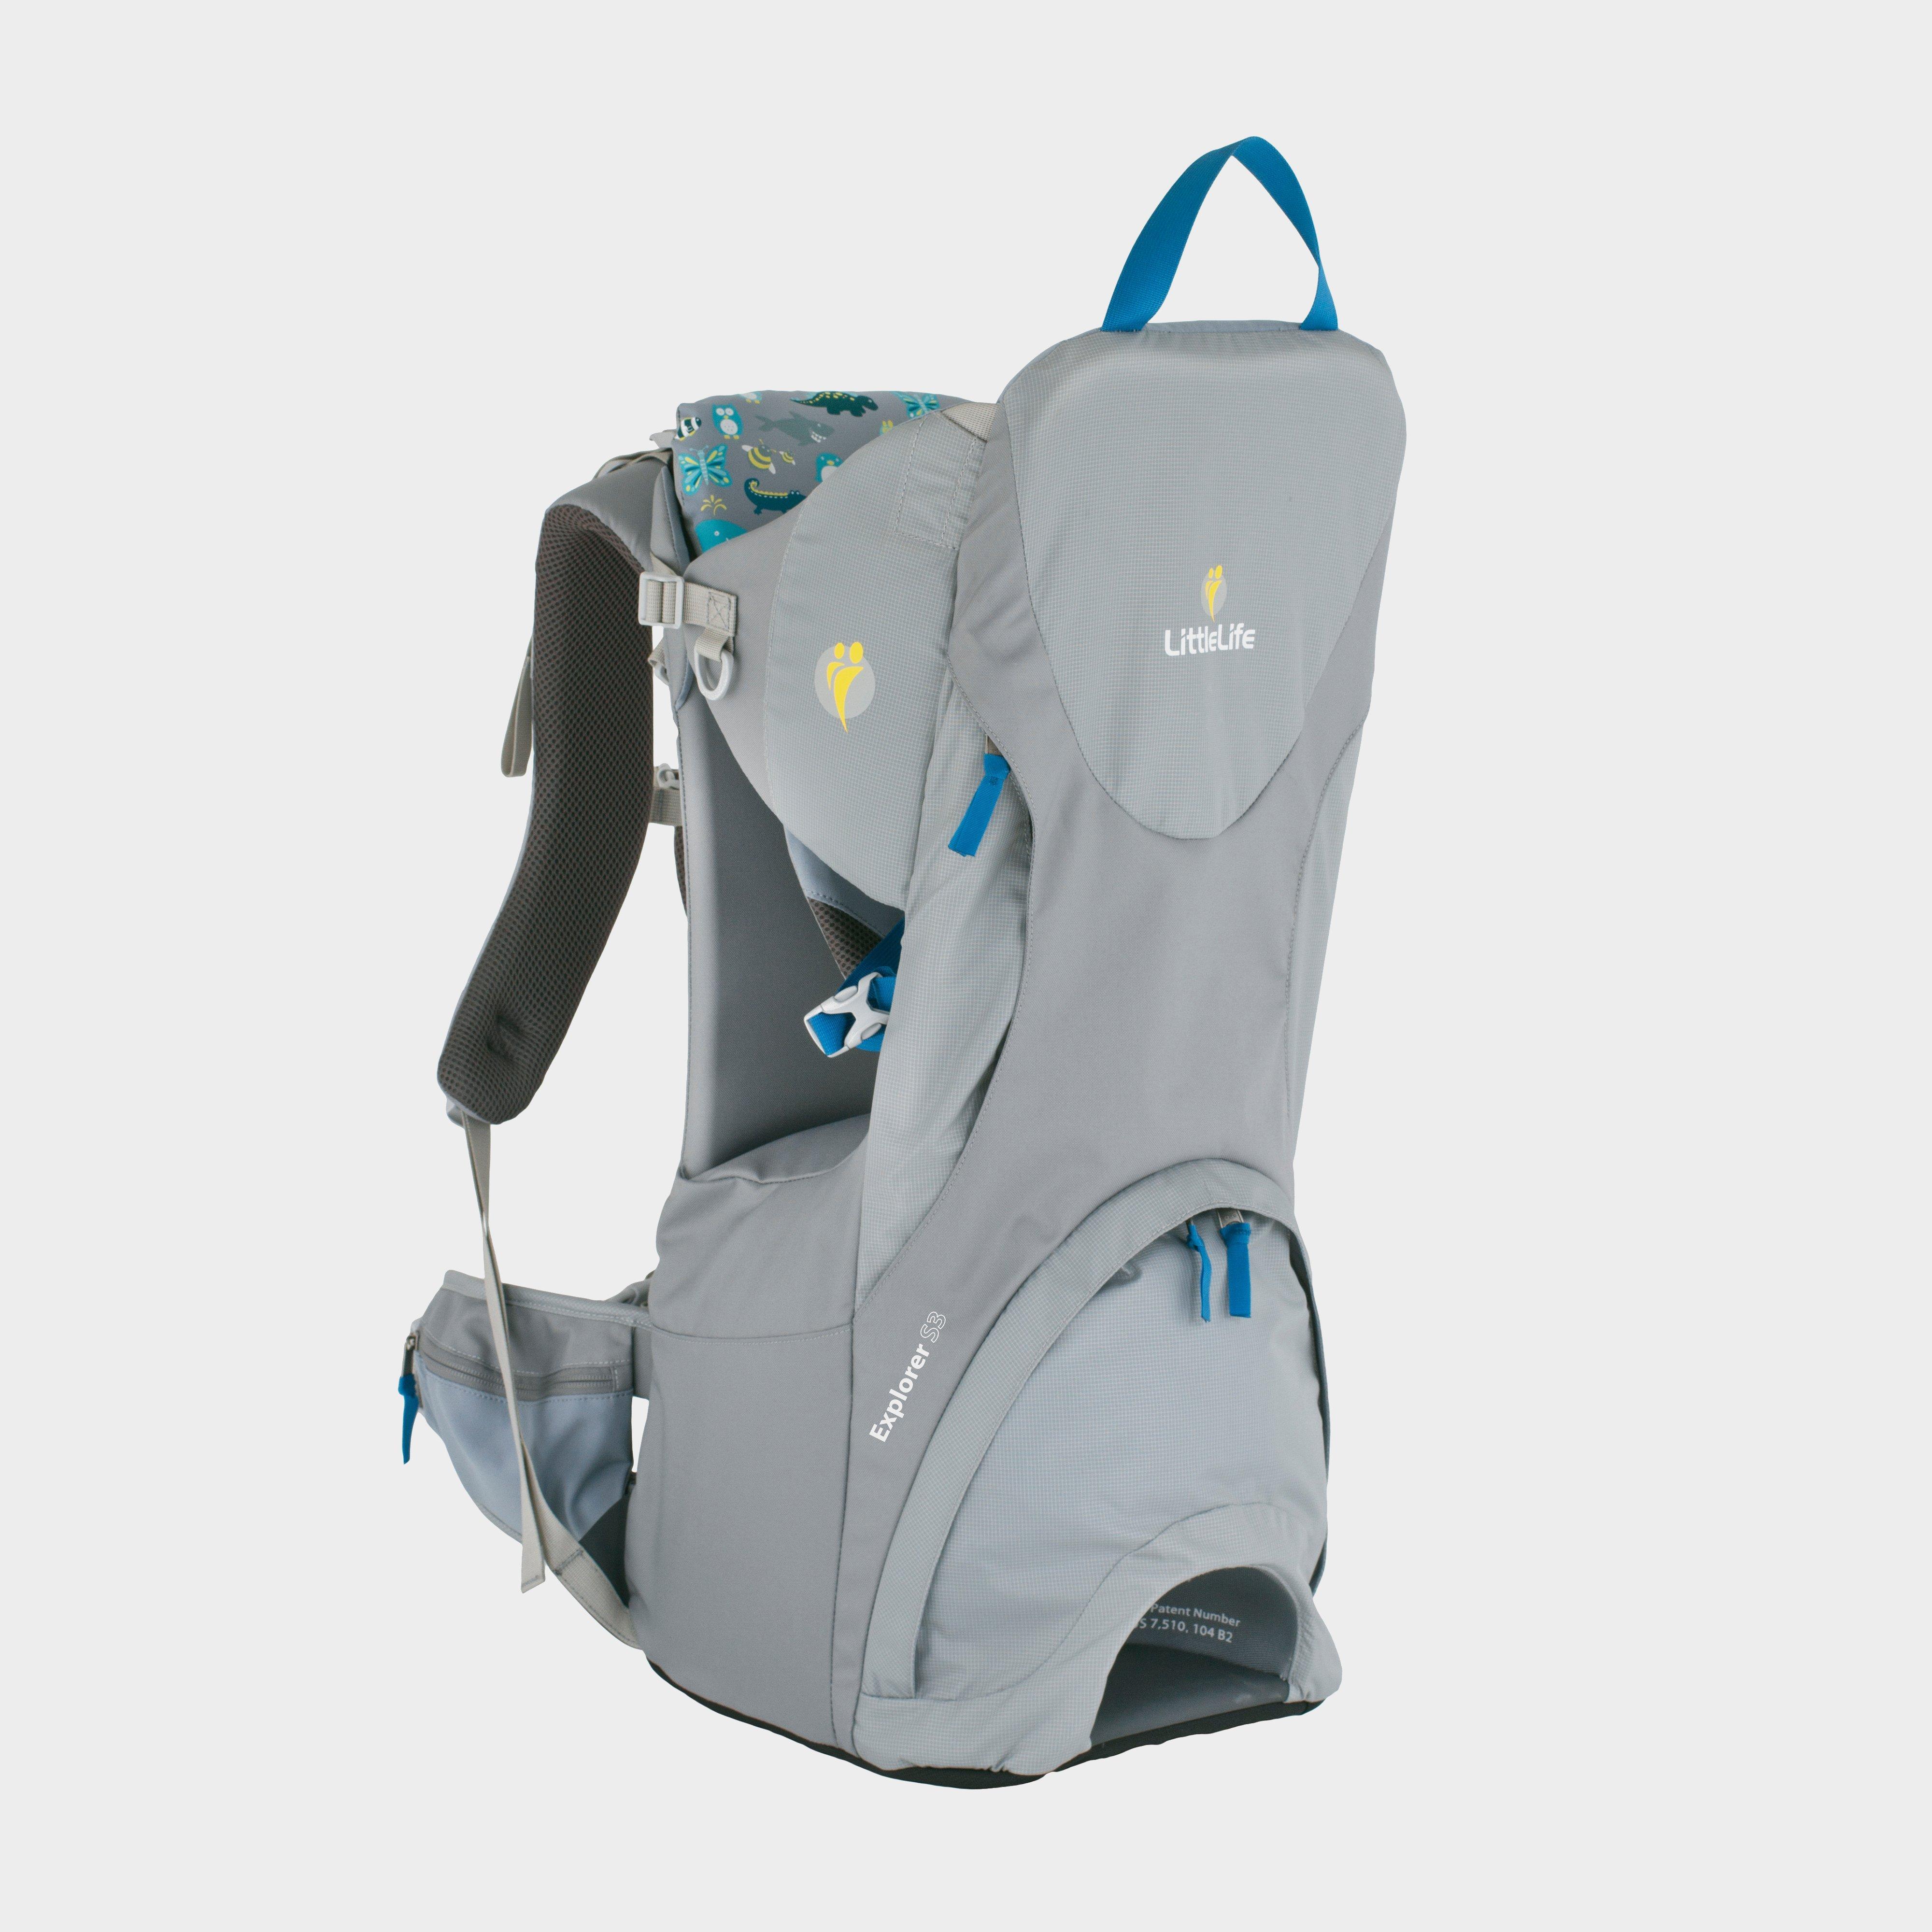 Littlelife Littlelife Explorer S3 Child Carrier - Grey, Grey